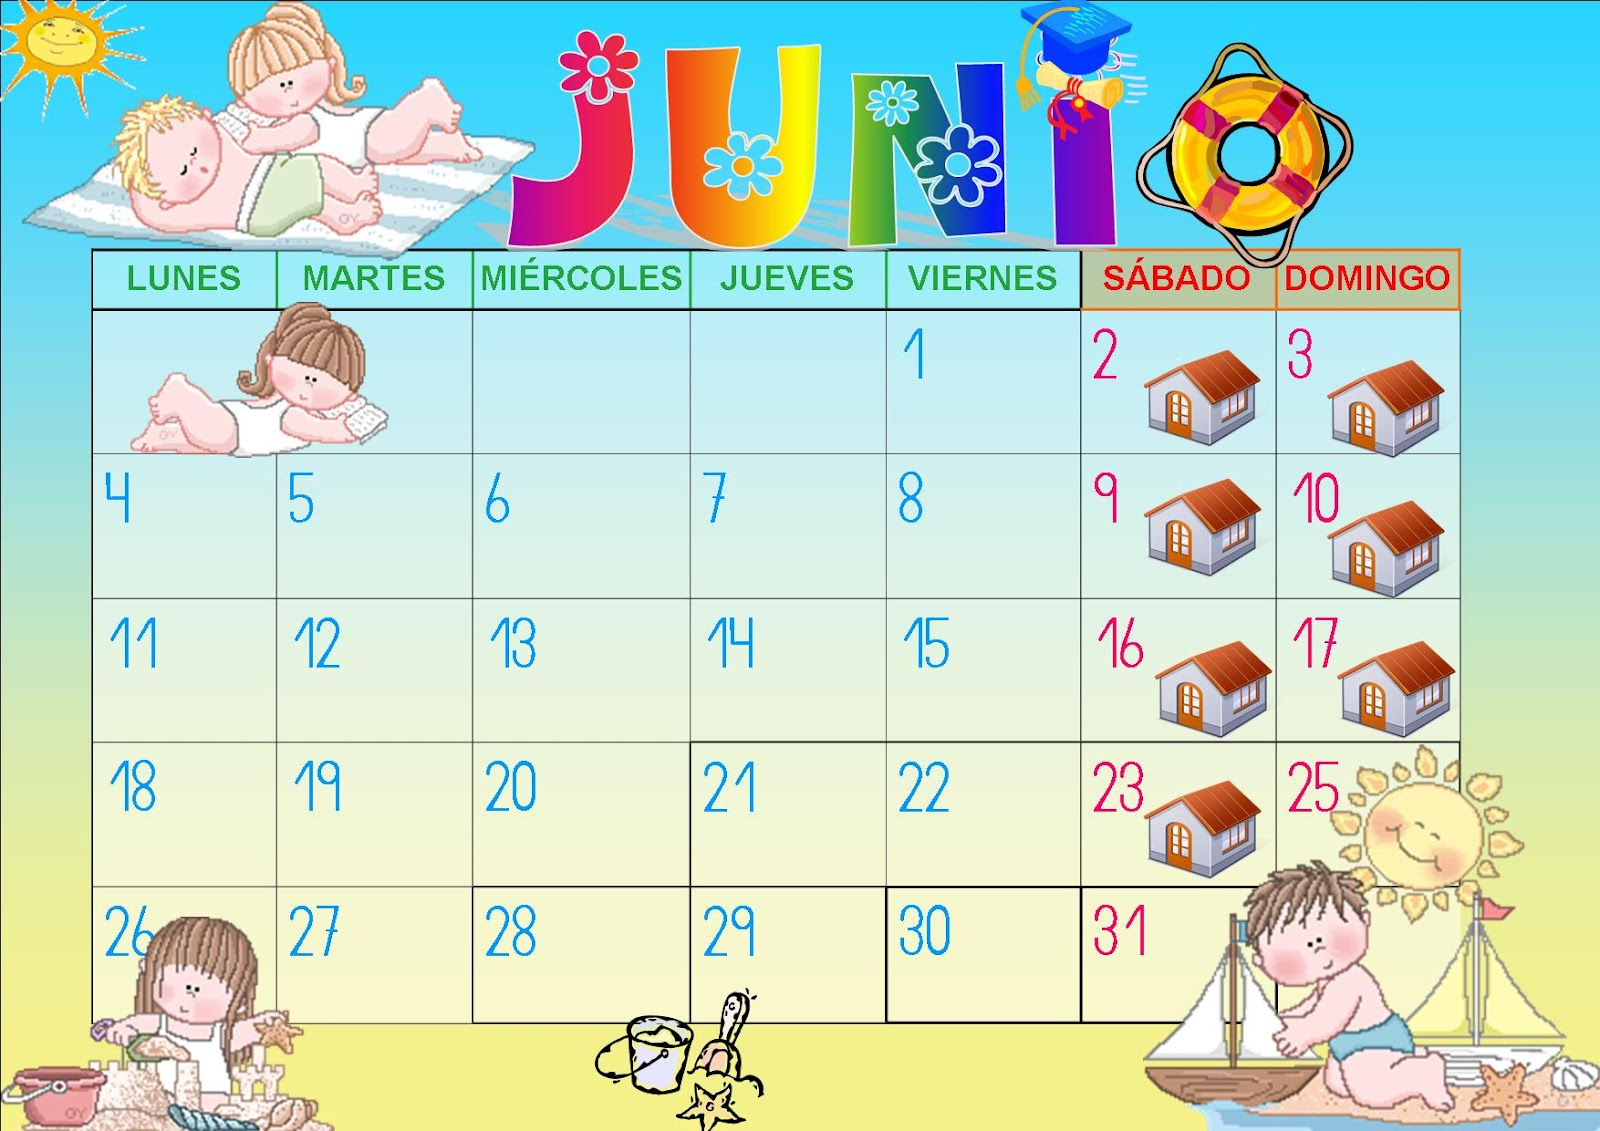 http://2.bp.blogspot.com/-aCMcEspvXTE/T8ZZEKsVN7I/AAAAAAAAK6w/gvaZMh6kKfY/s1600/CALENDARIO+JUNIO+2012+SIN+EVENTOS.jpg